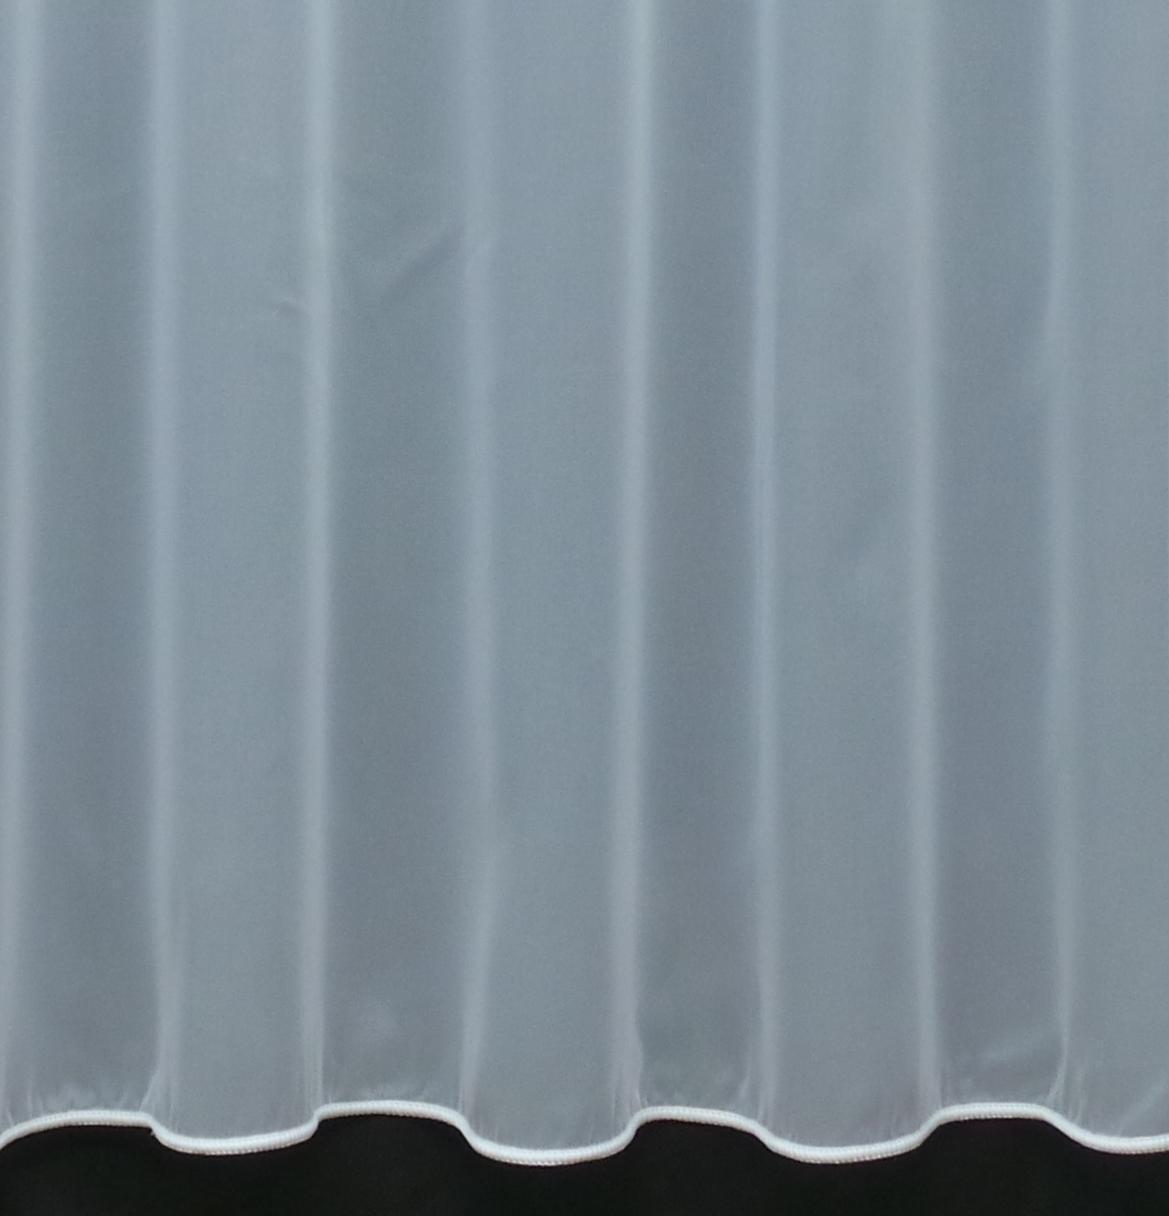 Fire Retardant Net Curtain - 1 Roll (20 meters) - Slot Top Header Weiß 81  Drop